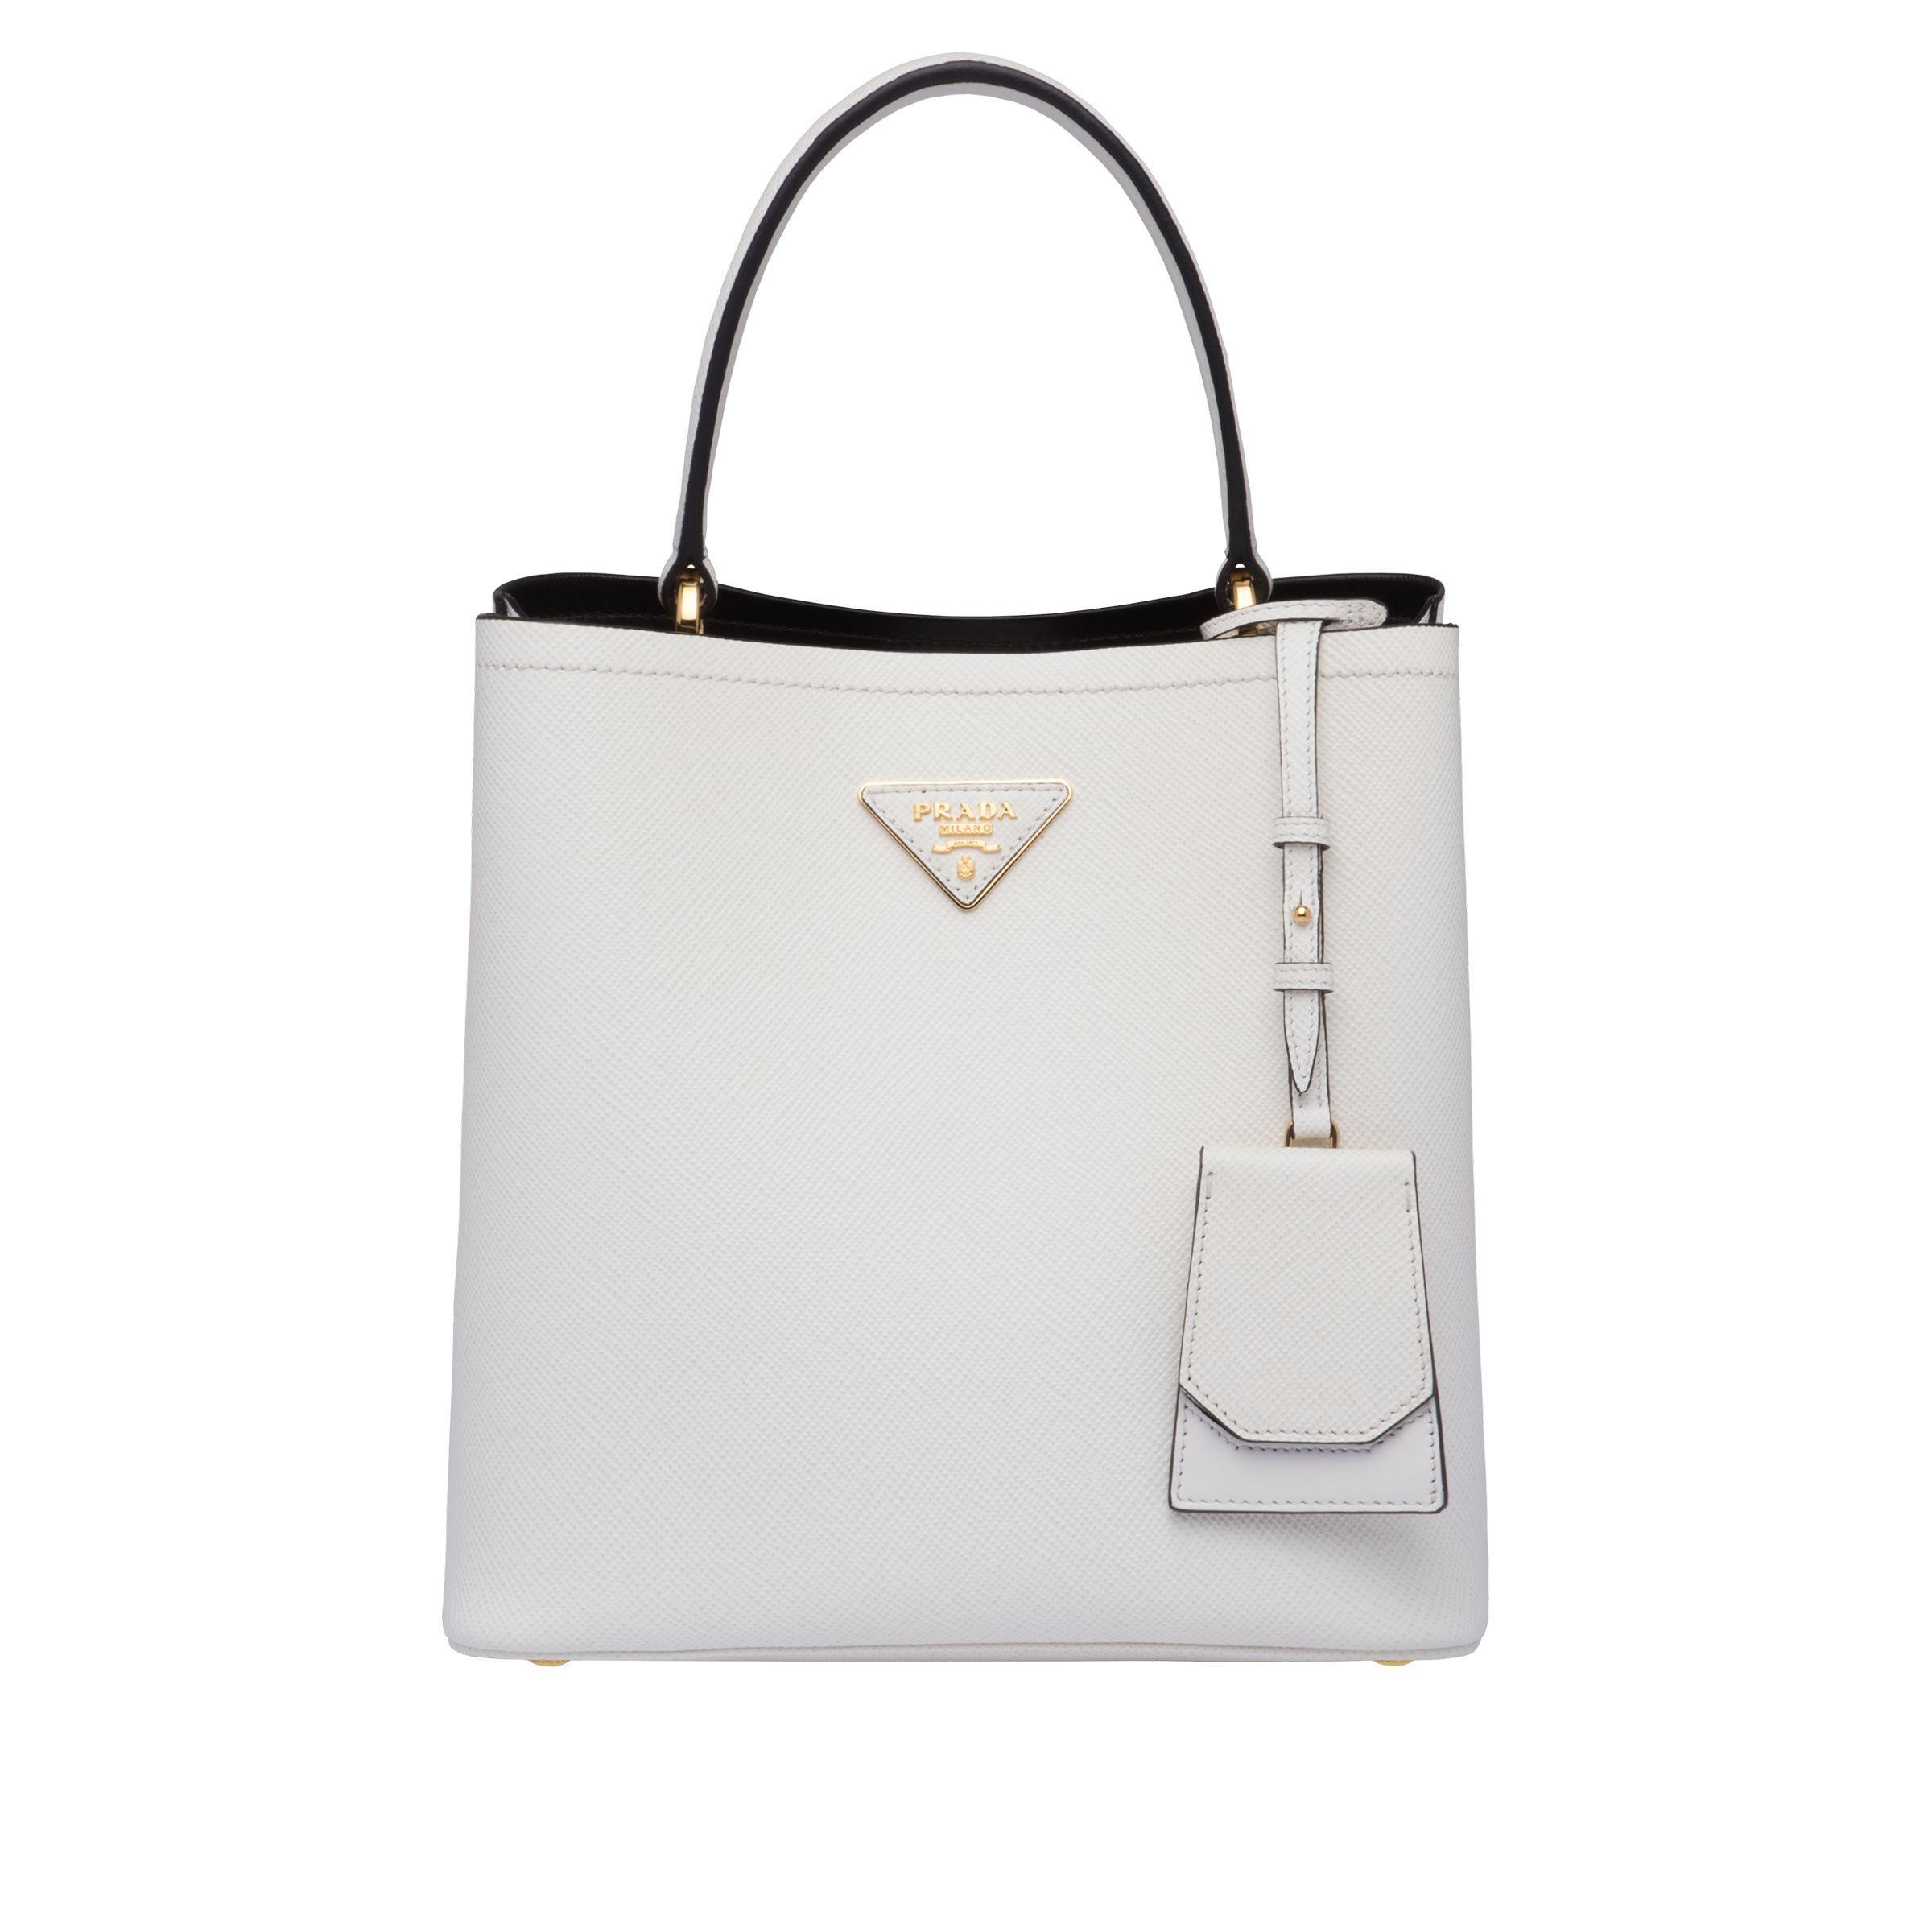 66711036af29 Prada - Multicolor Panier Medium Bag - Lyst. View fullscreen